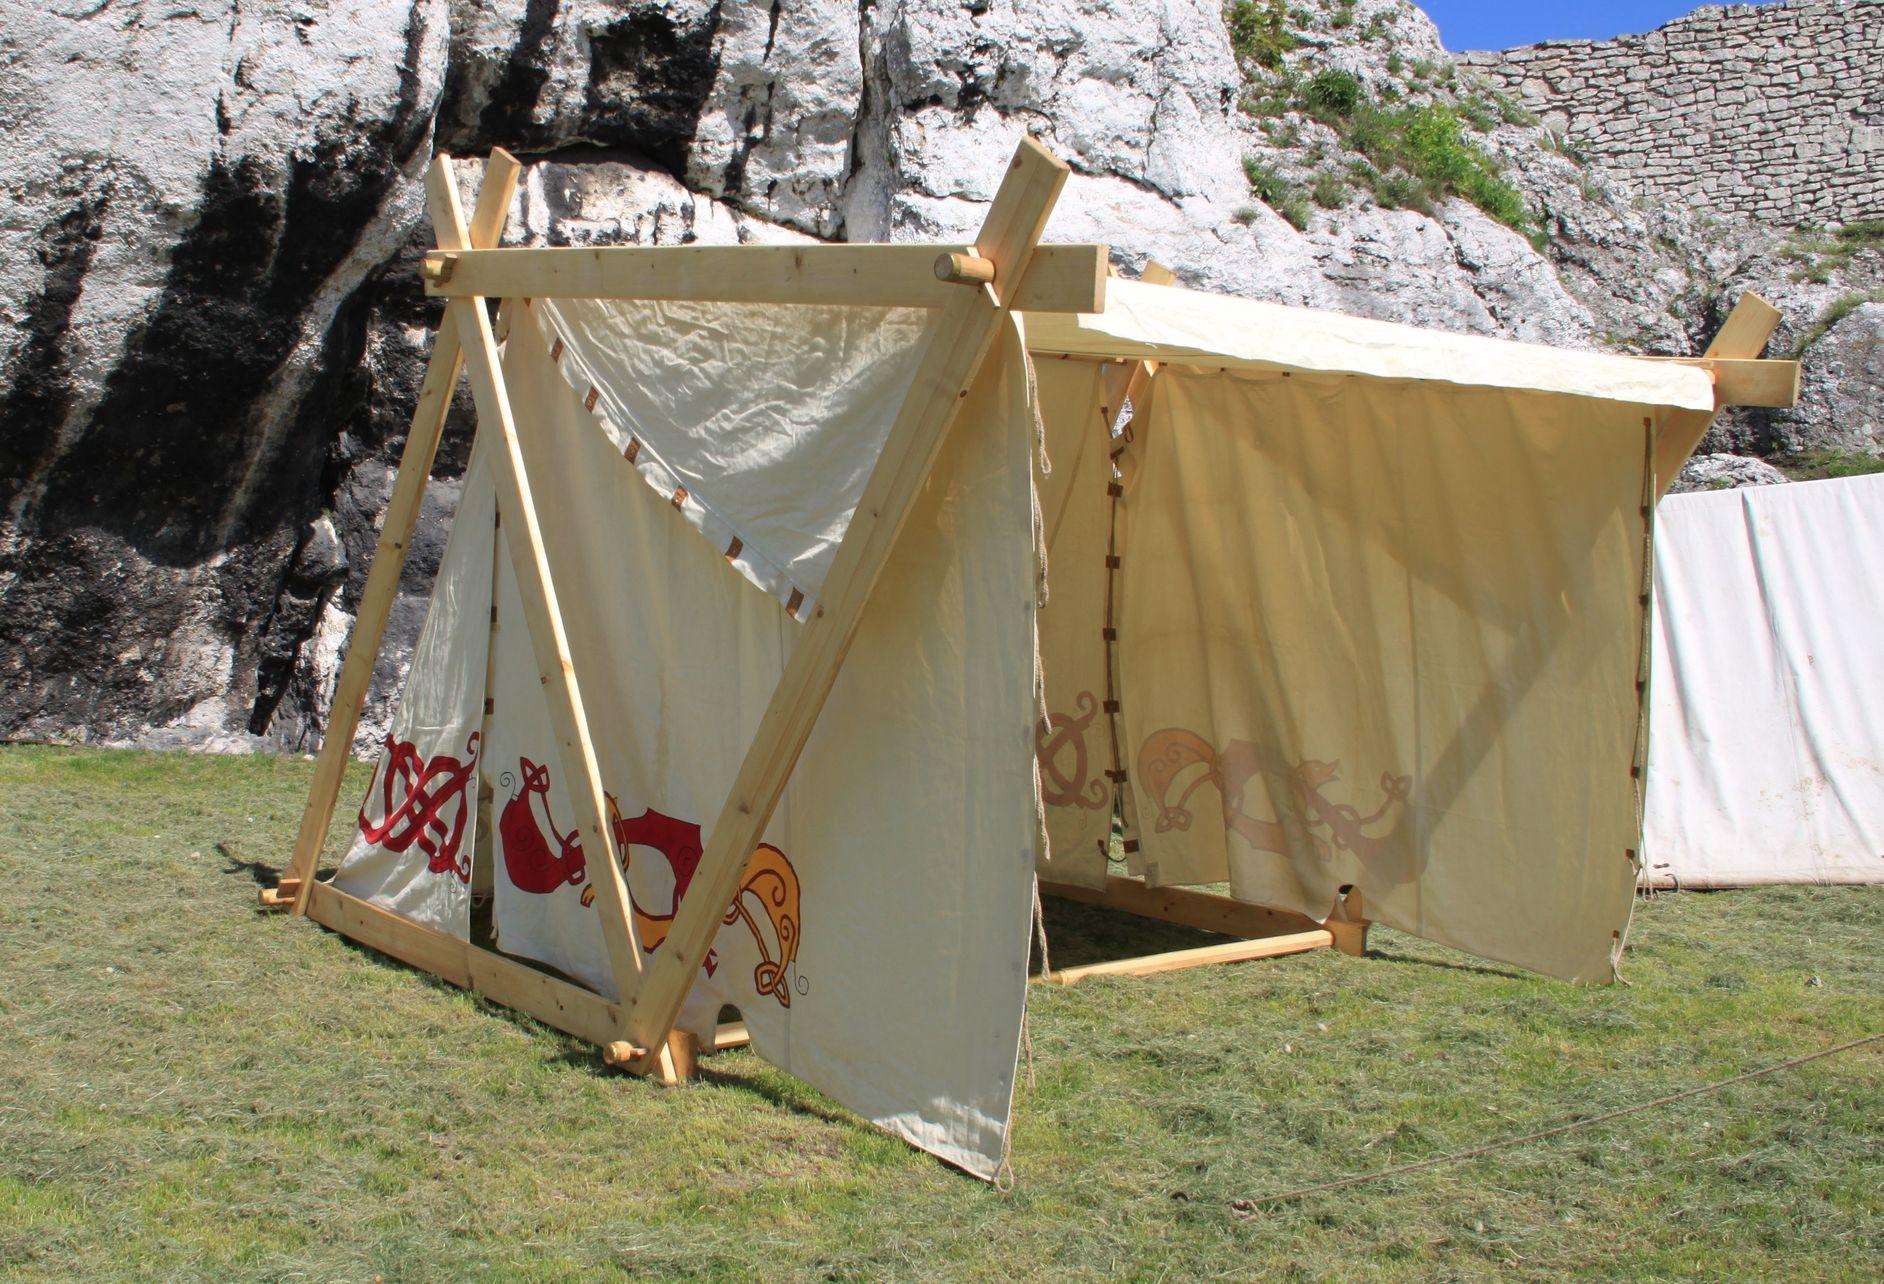 Historical tents - Tentorium - Anglo-Saxon Geteld historical tent soldier tents & Historical tents - Tentorium - Anglo-Saxon Geteld historical ...